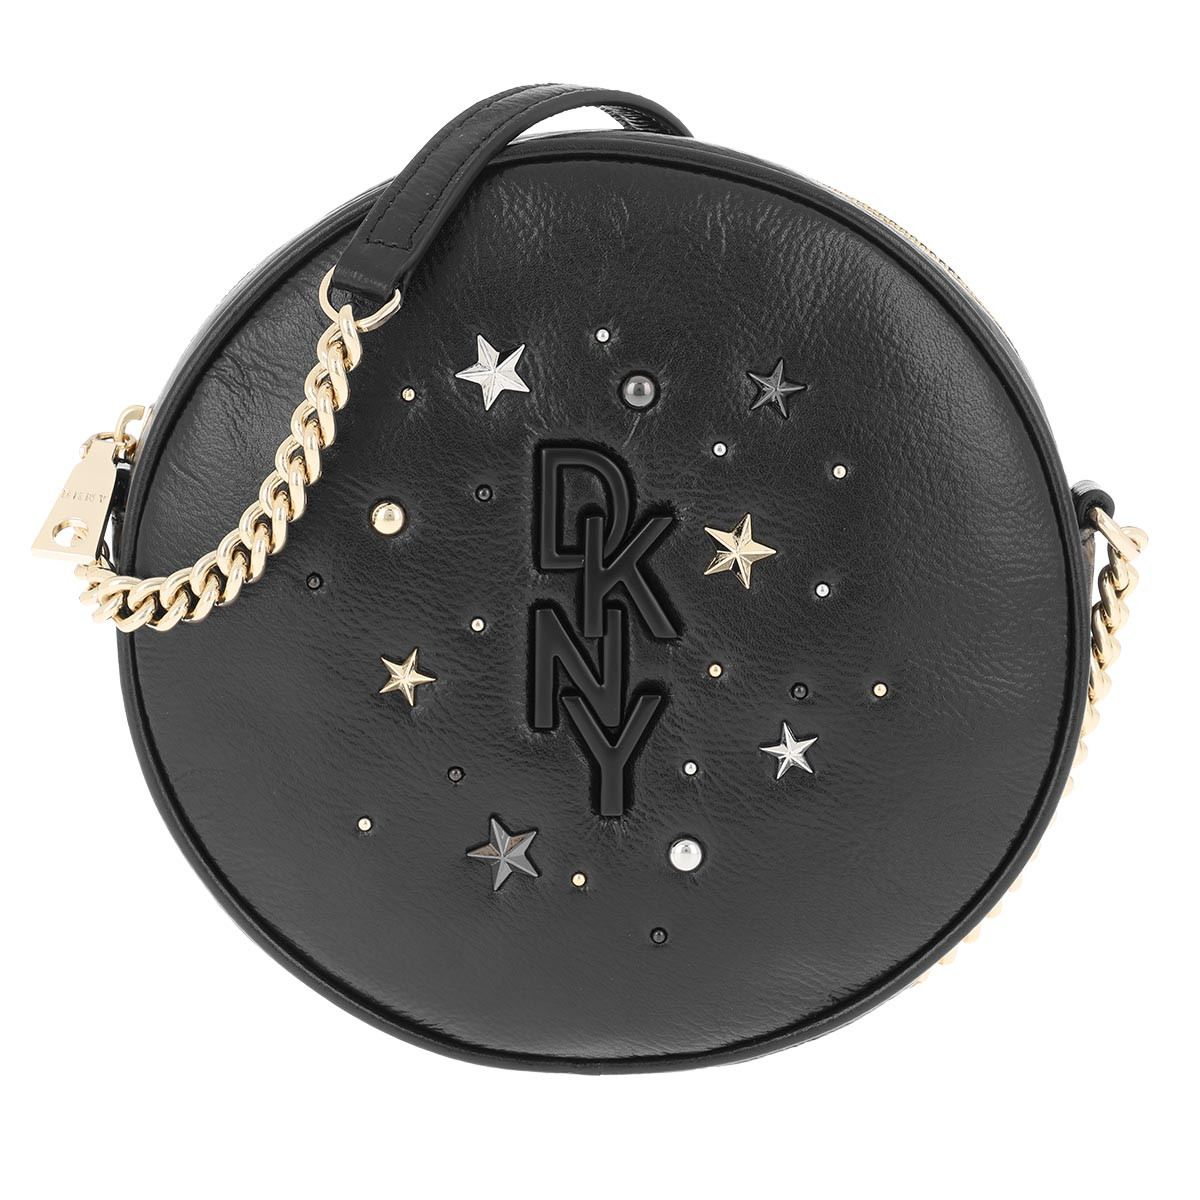 DKNY Umhängetasche - Krescent Canteen Crossbody Bag Black Gold - in schwarz - für Damen